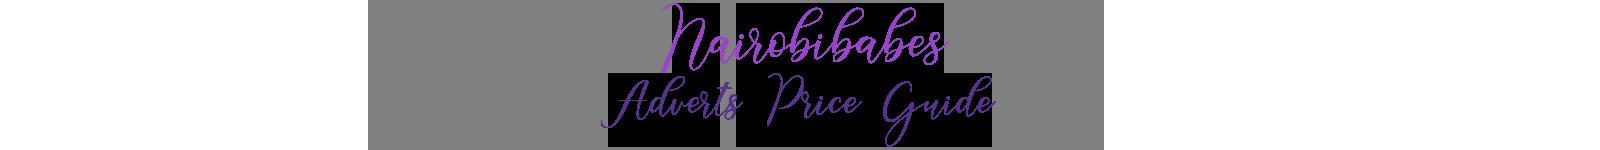 NairobiBabes-Advert-prices-Photo.